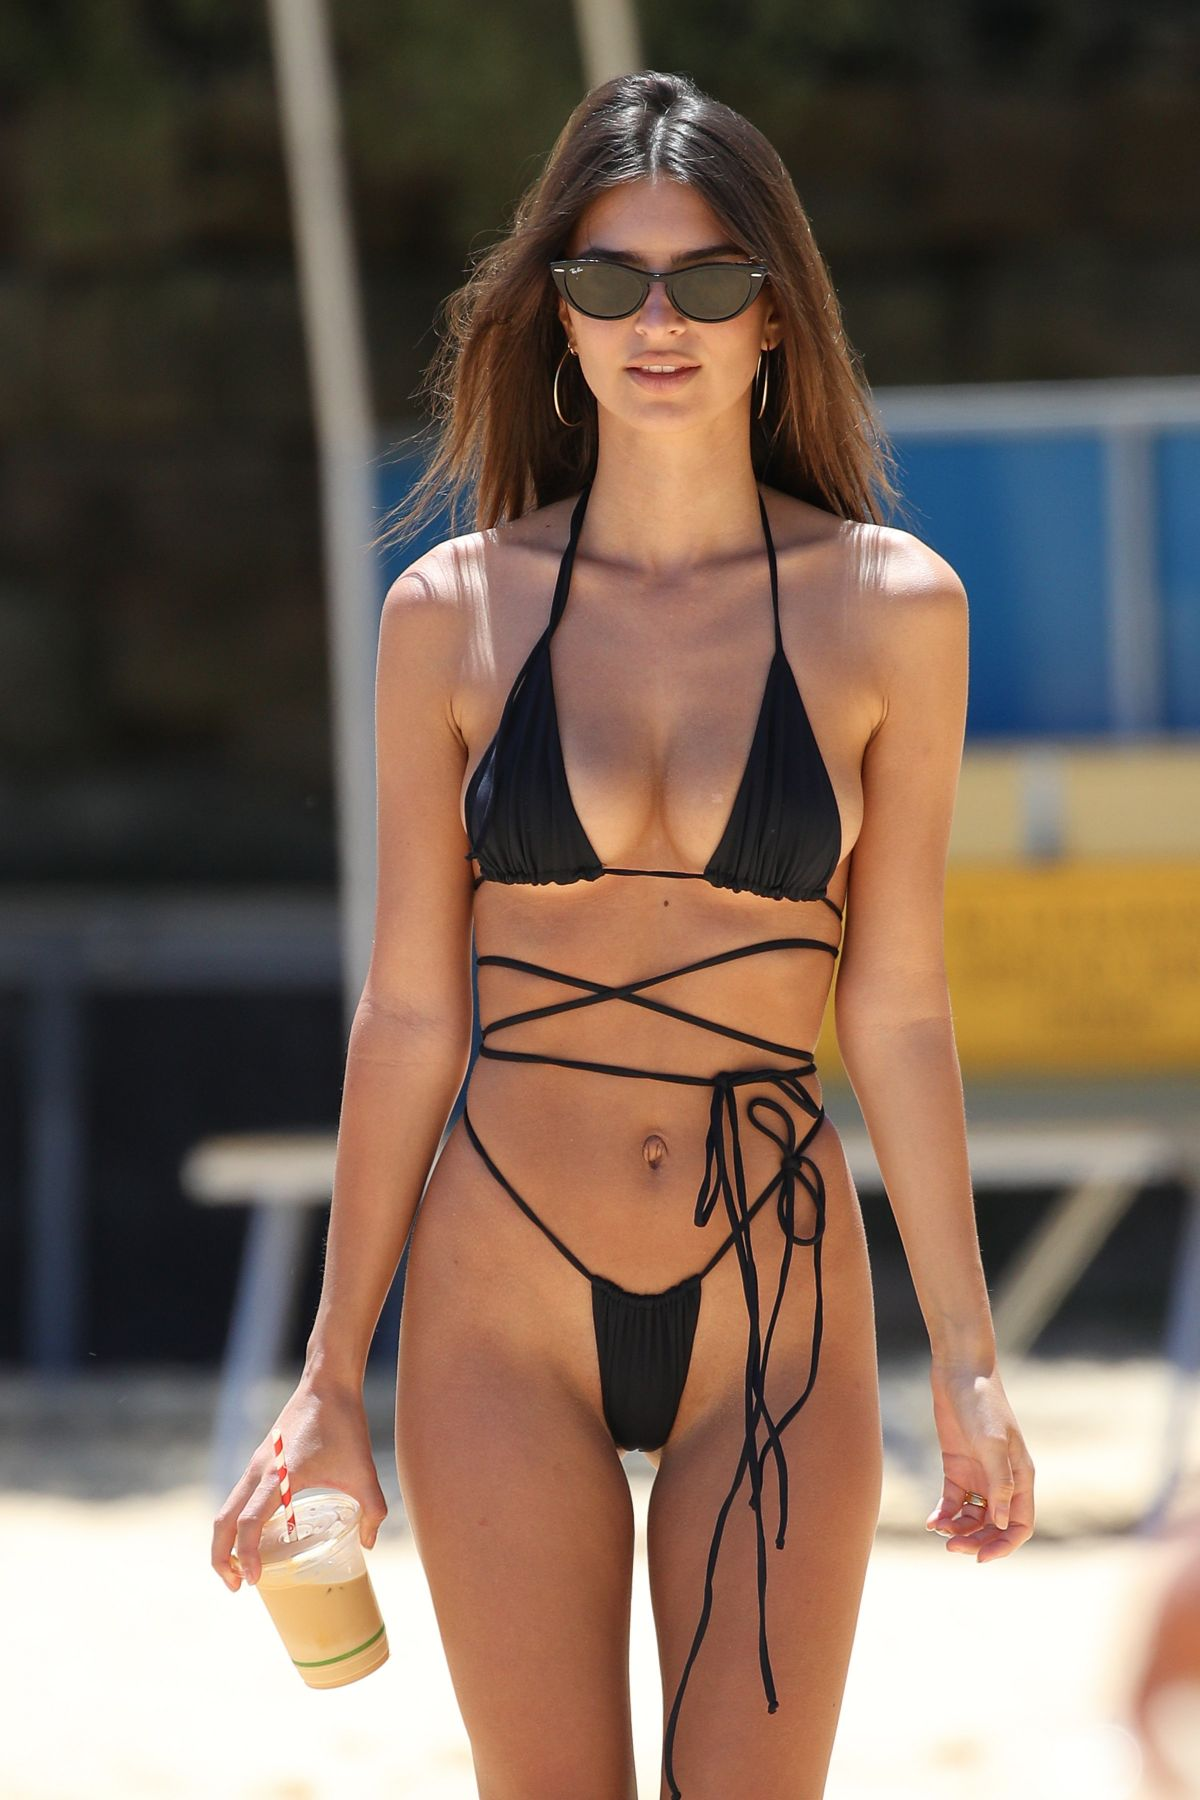 Bikini Sidney Fox naked (92 photo) Bikini, YouTube, underwear